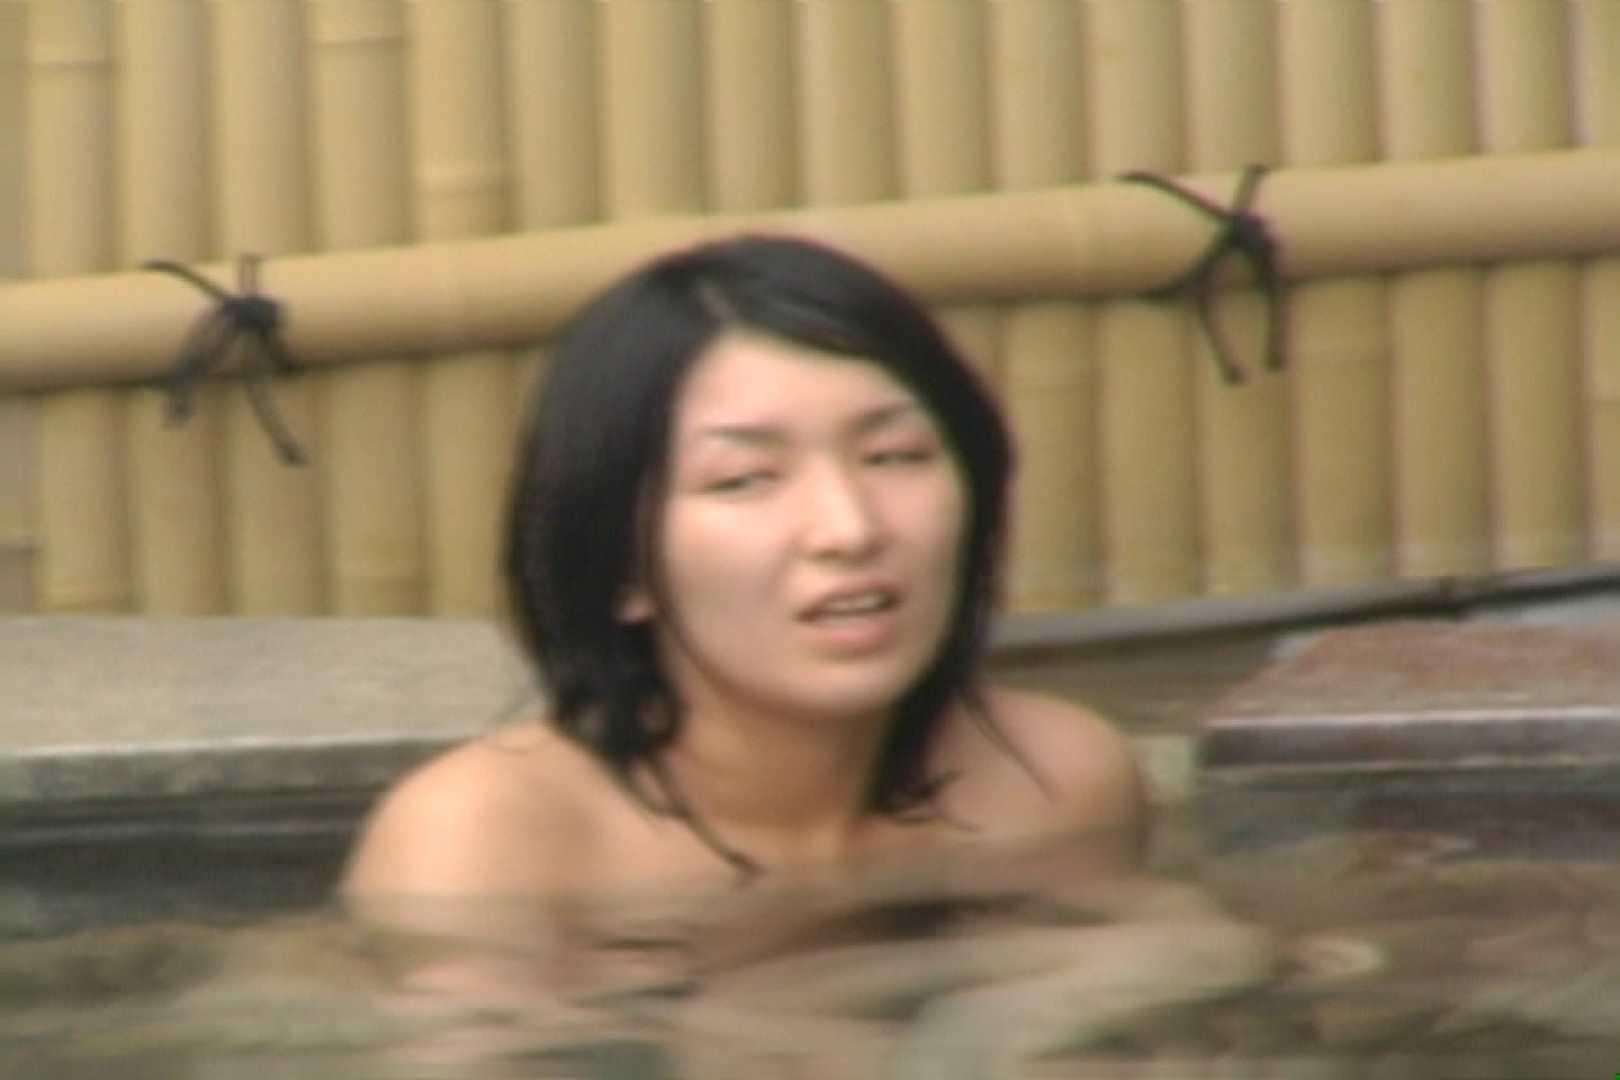 Aquaな露天風呂Vol.618 盗撮  67連発 30